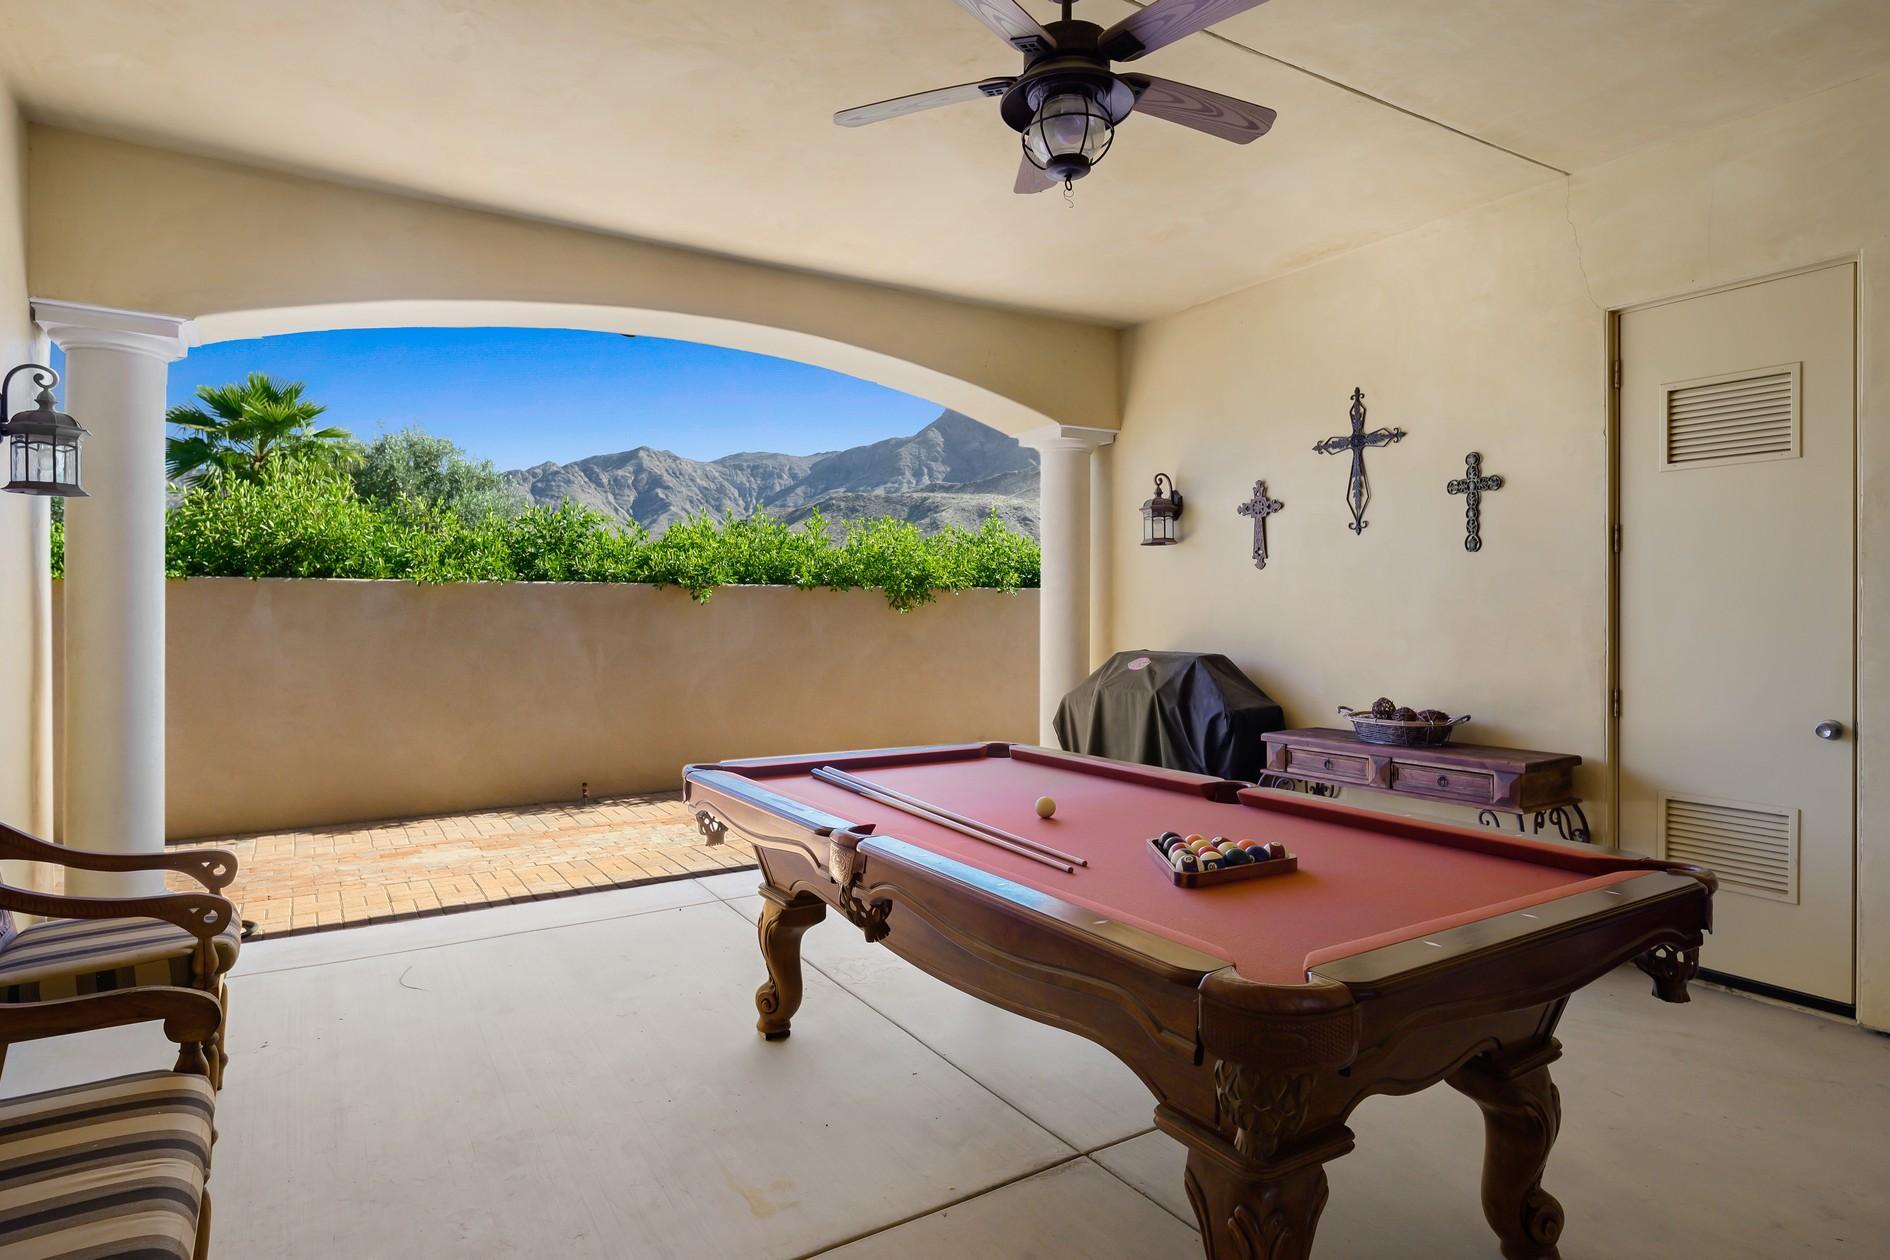 38785 Peterson Road, Rancho Mirage, California 92270, 5 Bedrooms Bedrooms, ,6 BathroomsBathrooms,Residential,For Sale,38785 Peterson Road,219042664